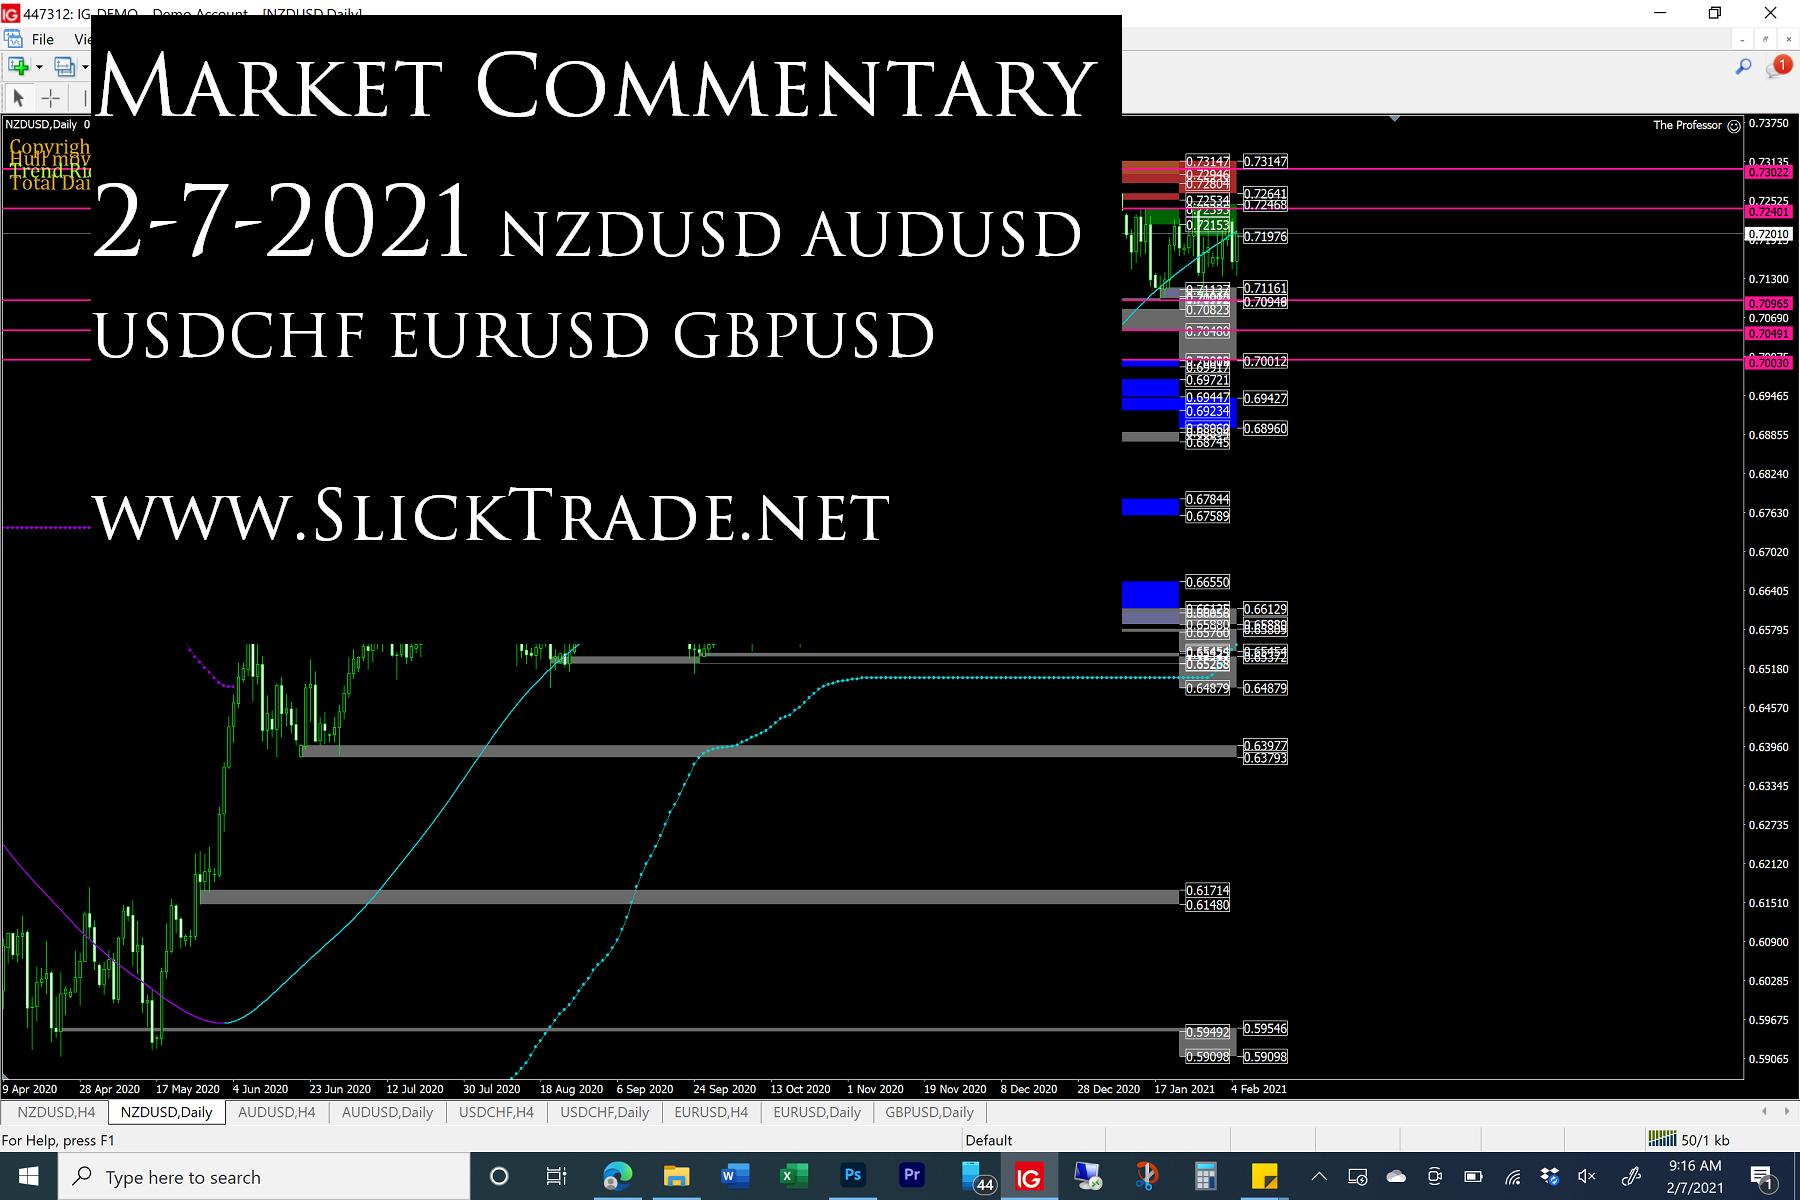 Market Commentary 2-7-2021 - NZDUSD AUDUSD USDCHF EURUSD GBPUSD